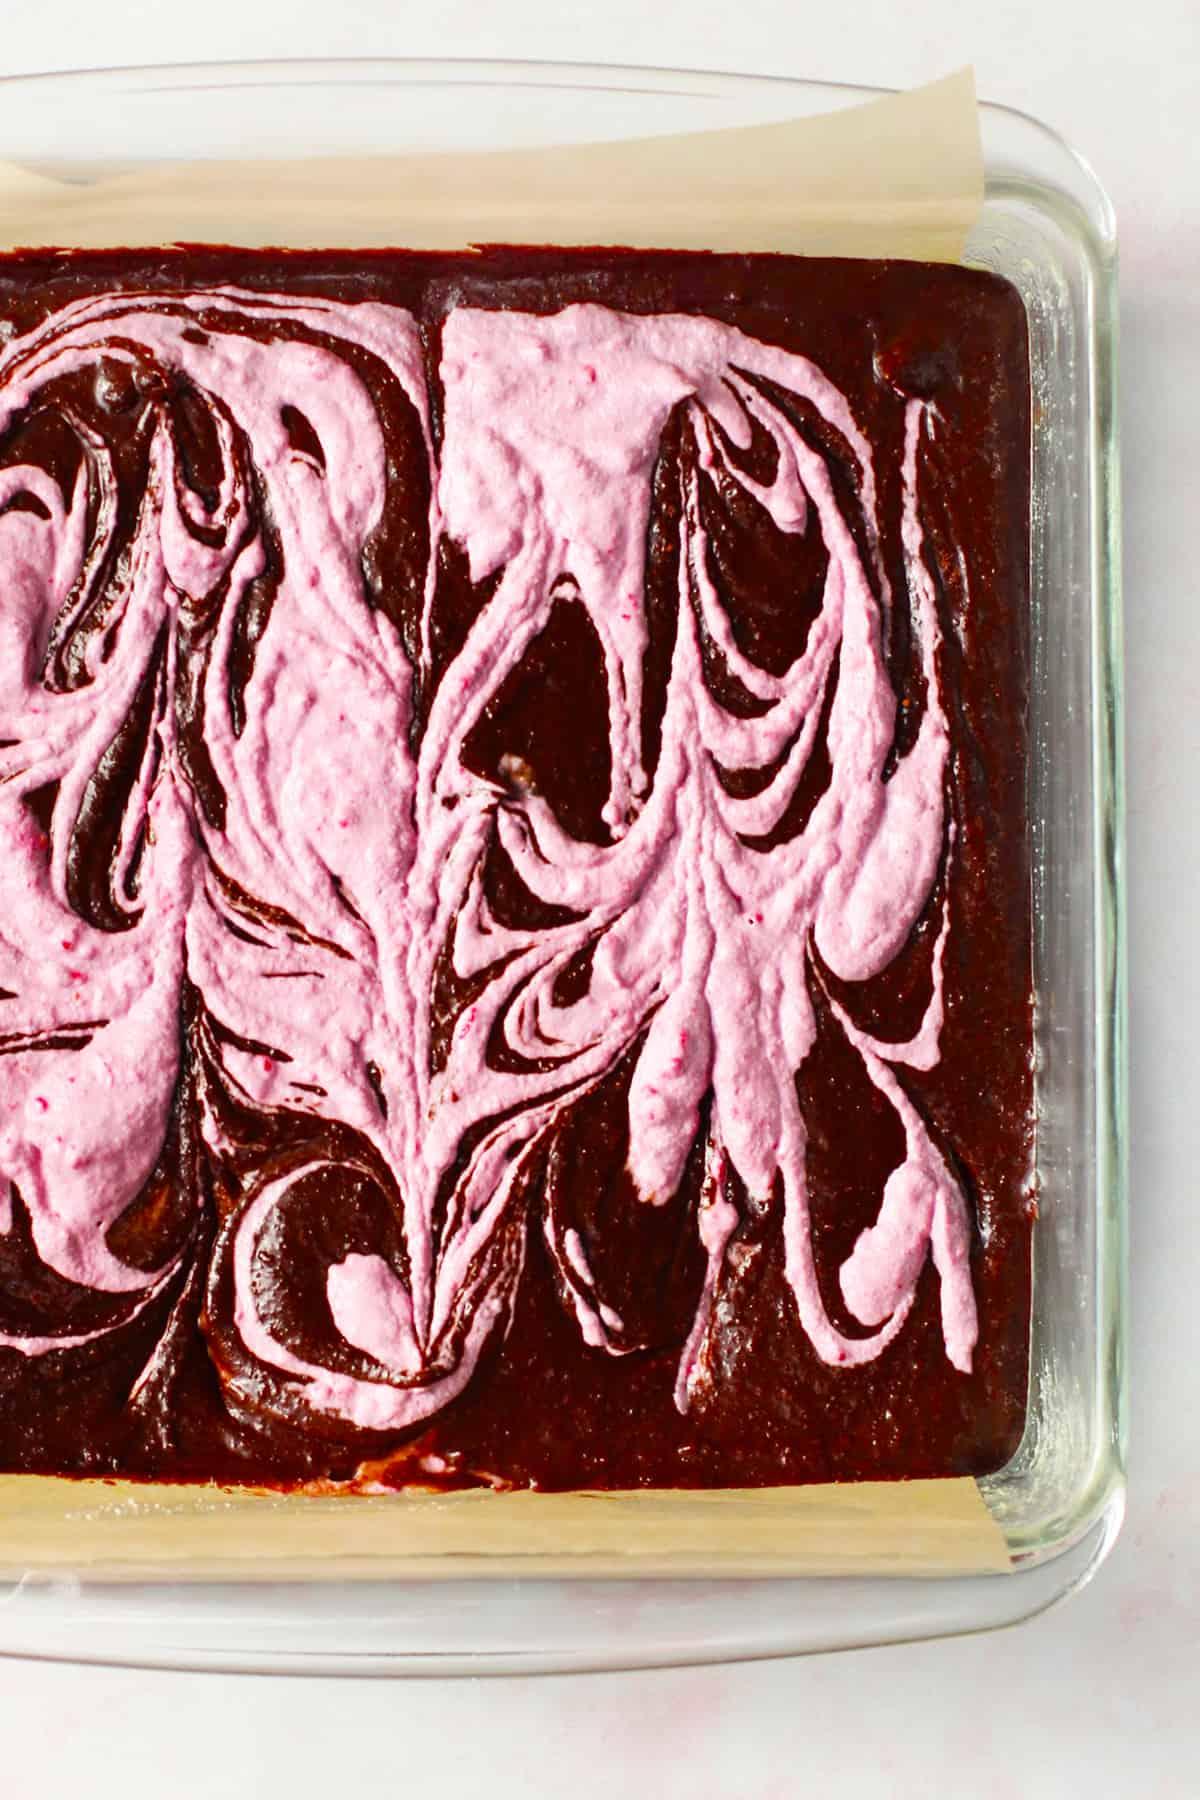 Raspberry cream swirled throughout brownie batter.